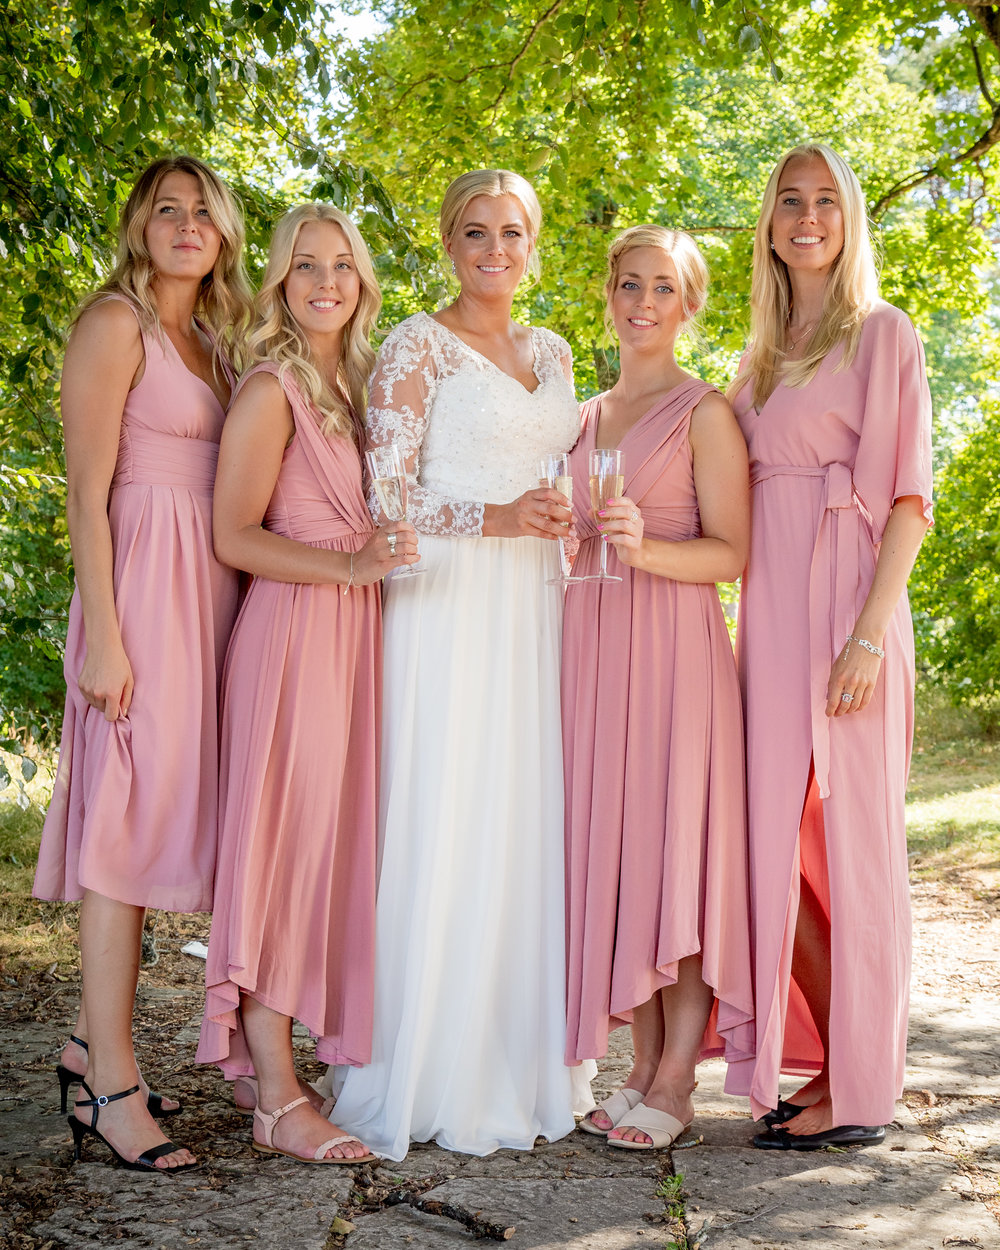 20180714-örebro-bröllop-795.jpg